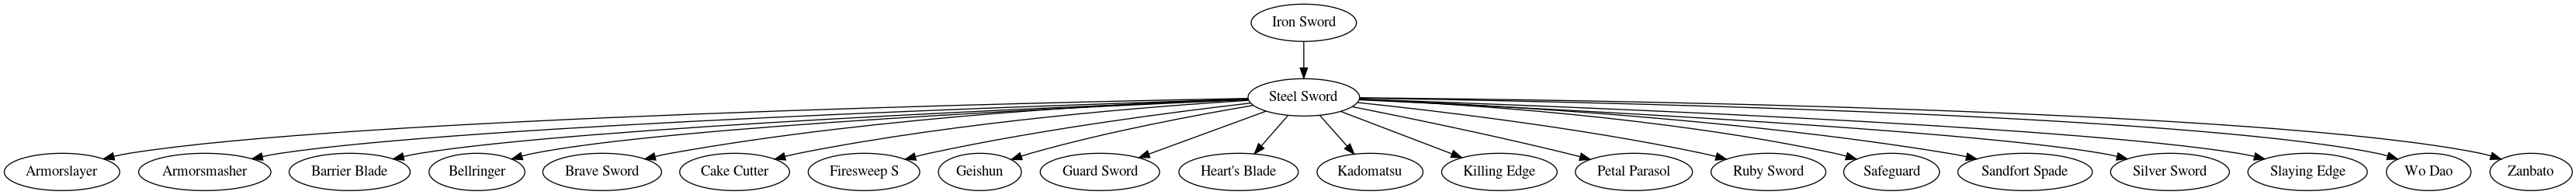 Skill graph of Steel Sword